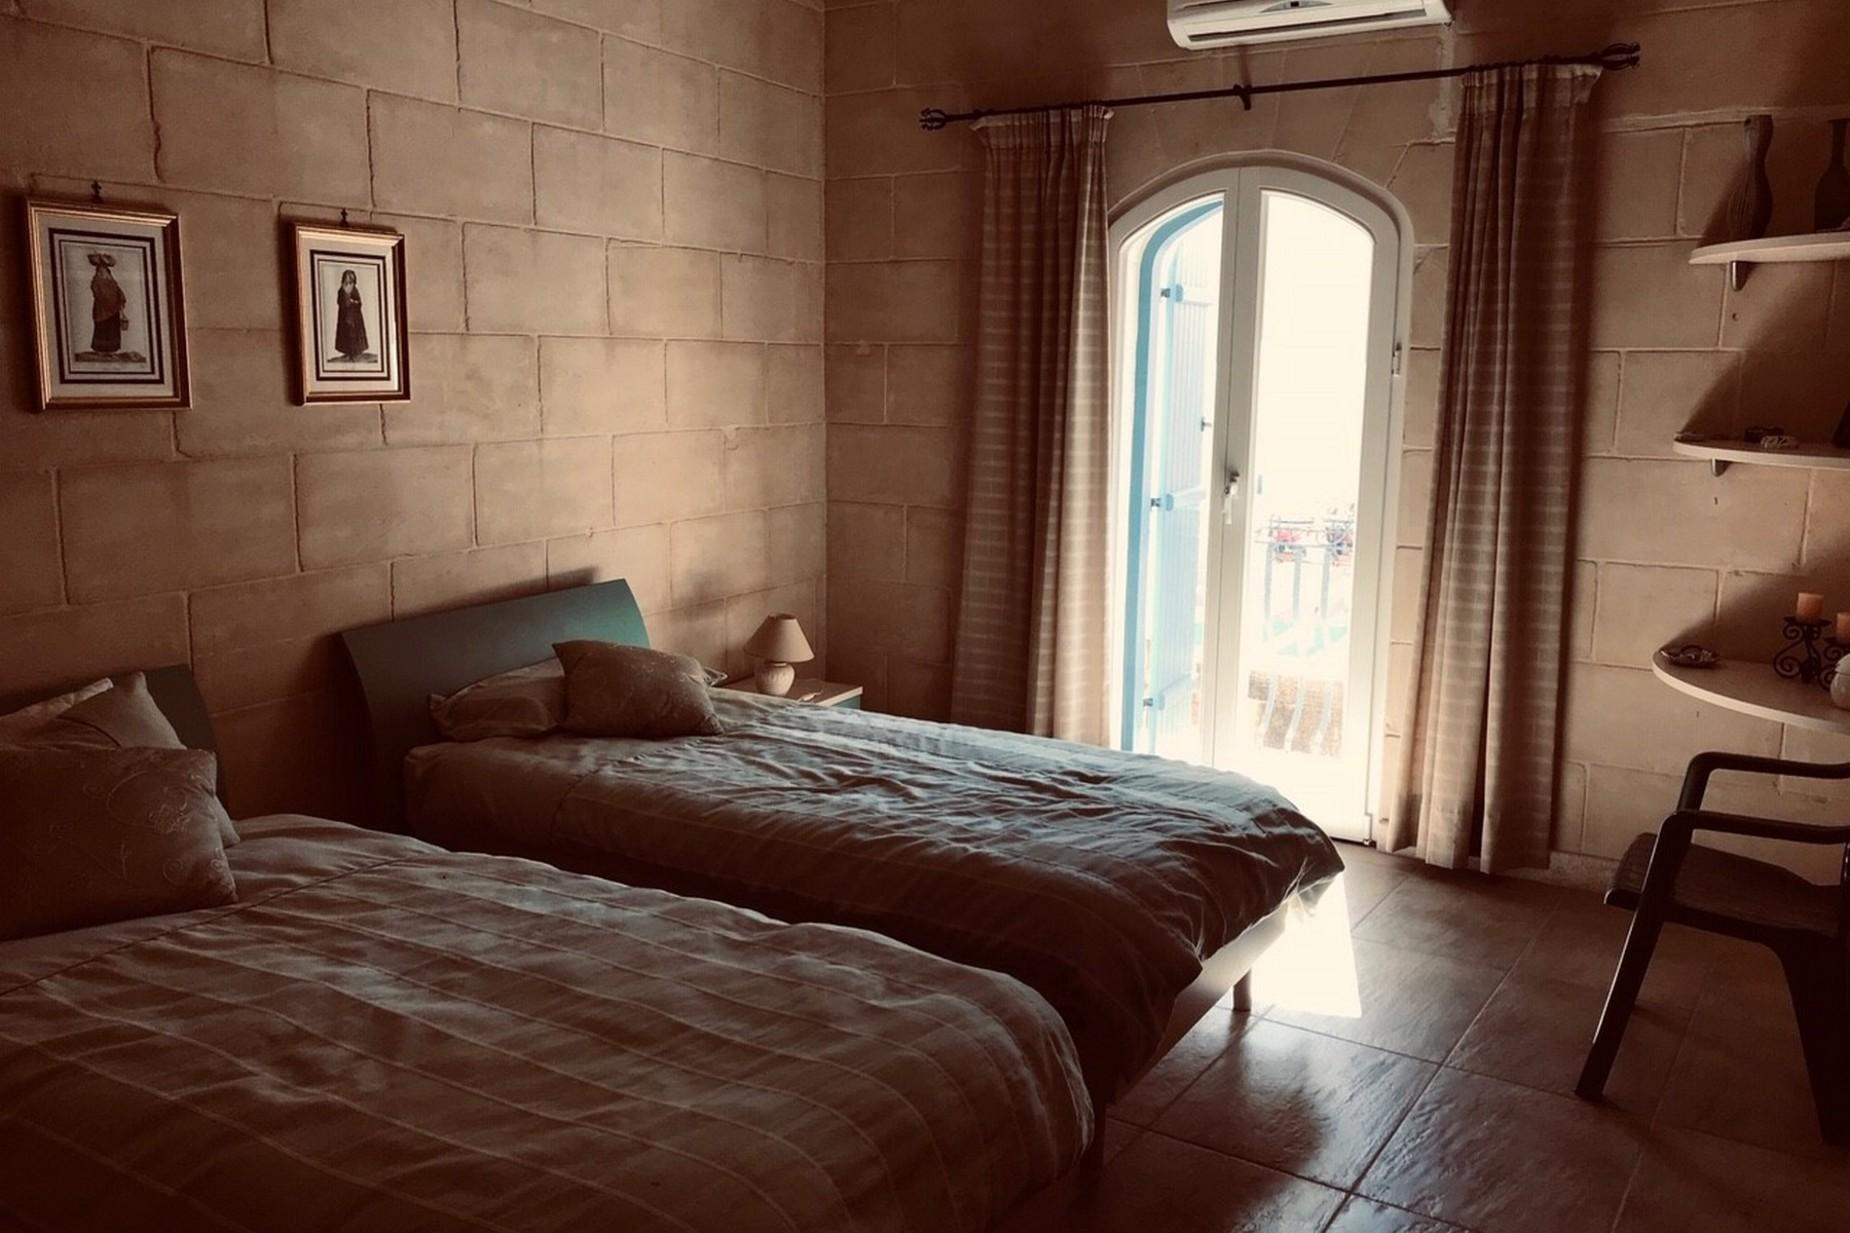 4 bed Farmhouse For Sale in Nadur, Nadur - thumb 13